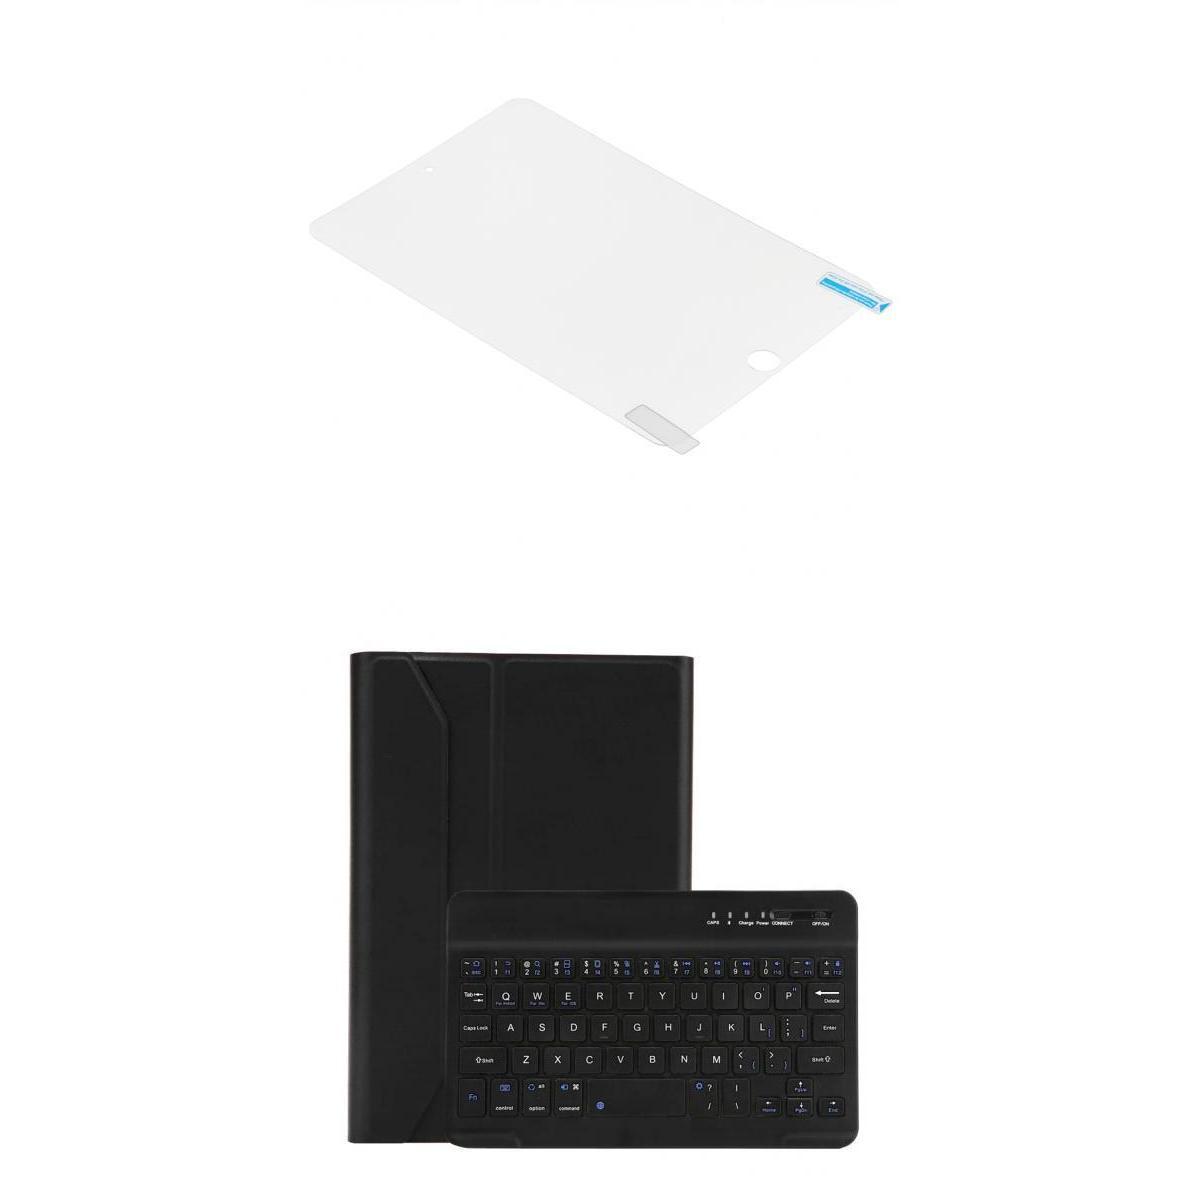 STK스마트 이동식 블루투스 키보드 포장 케이스 u0026 iPad Mini4 용 스크린 커버